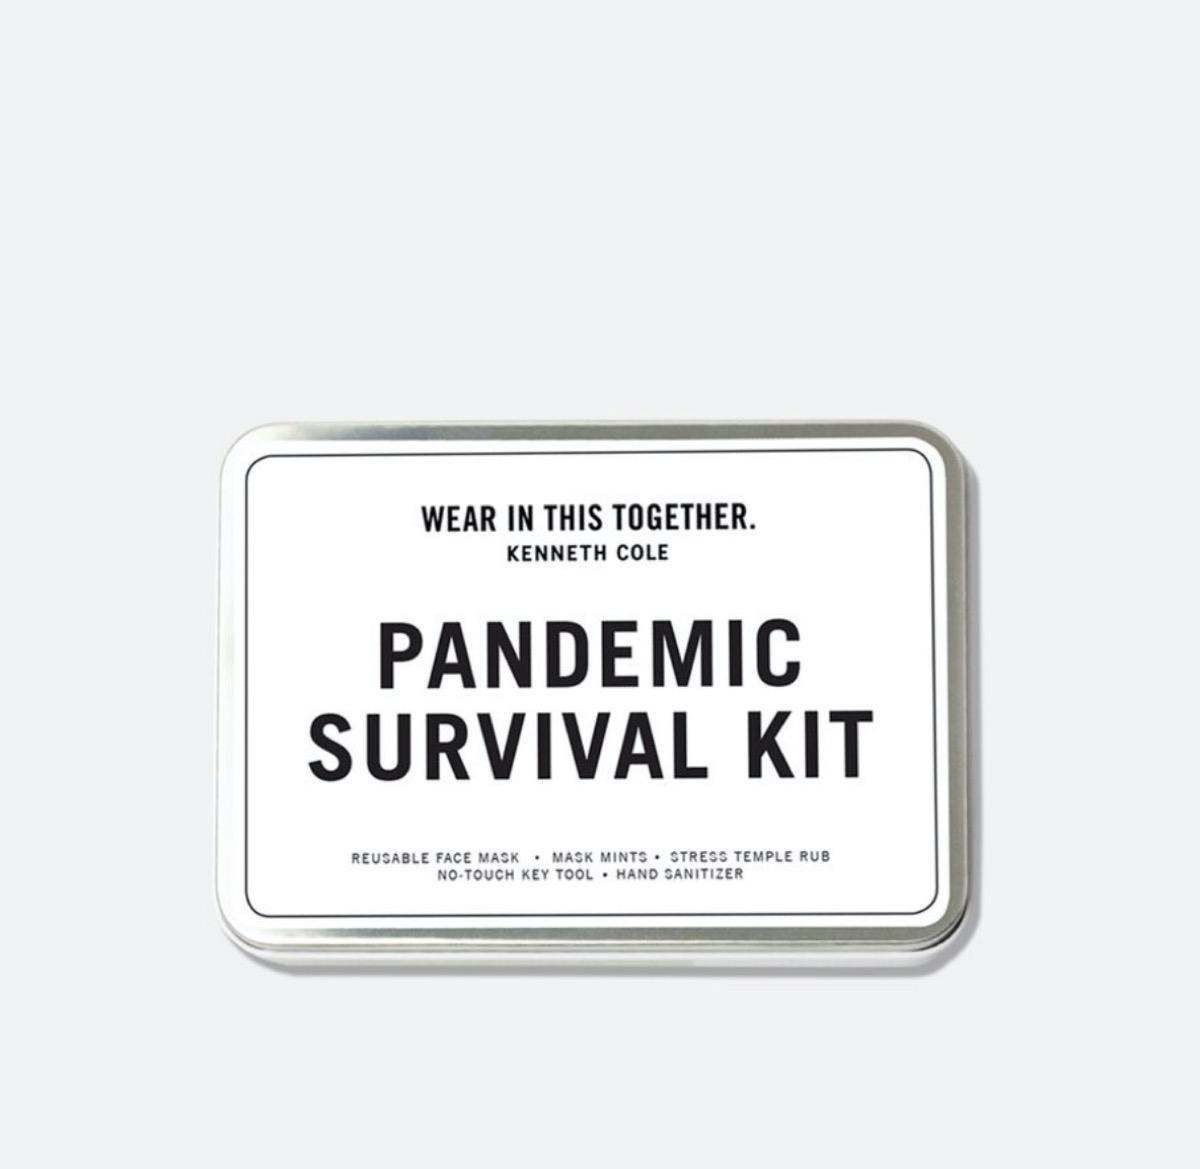 pandemic survival kit in white box